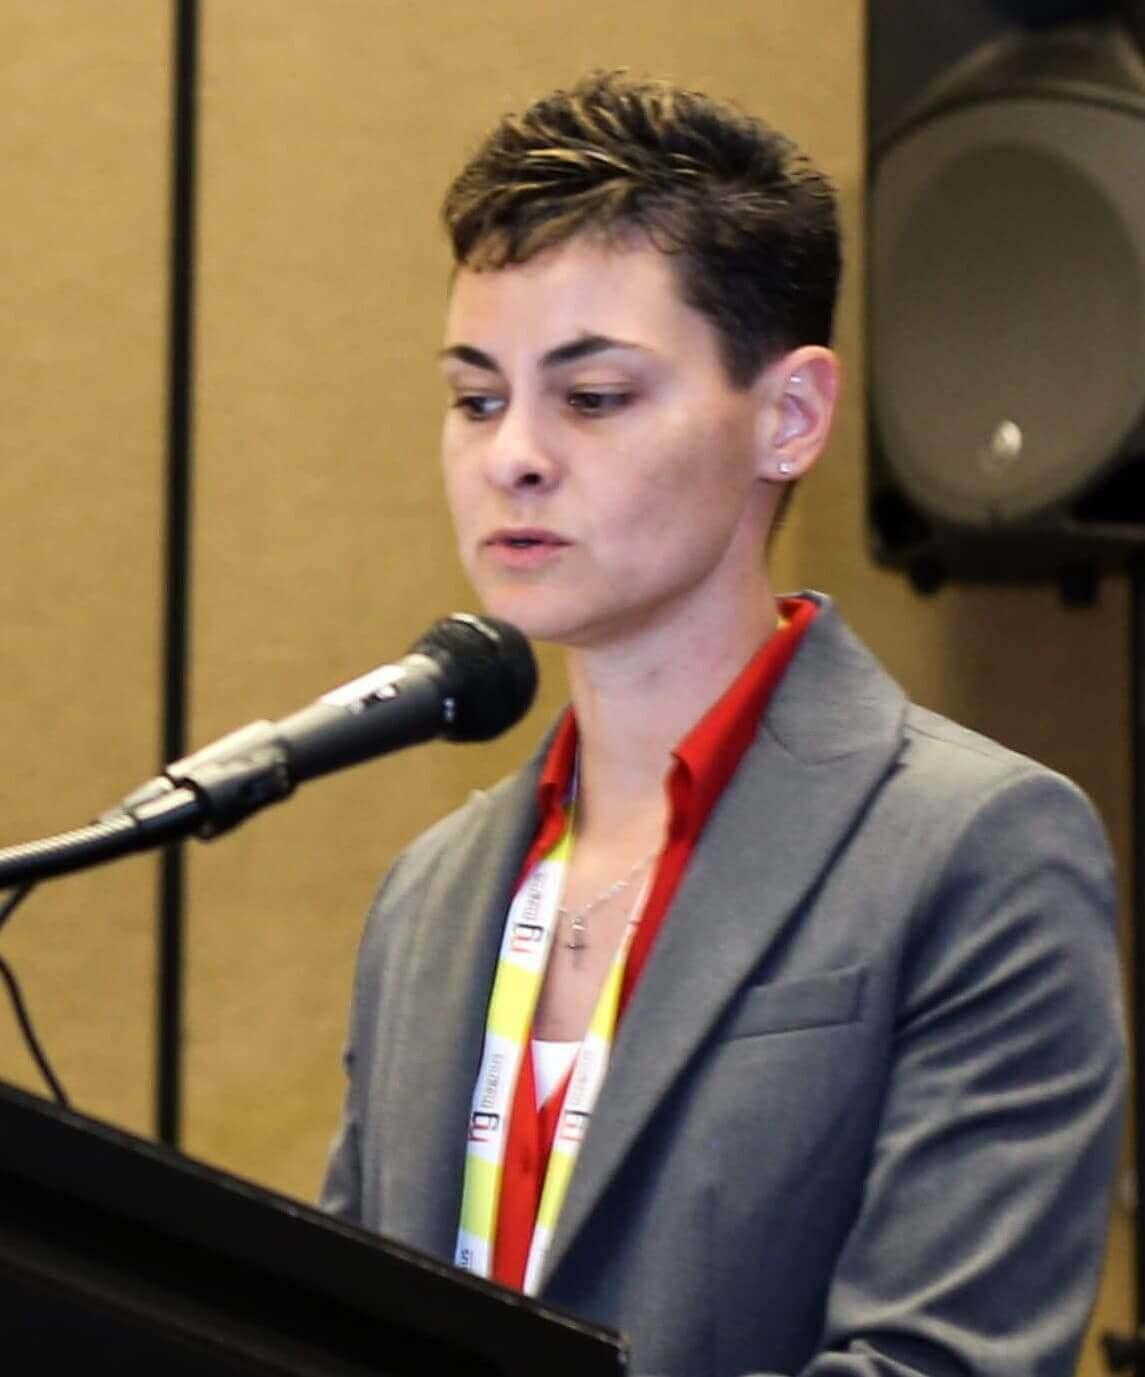 Speaker at Nursing education conferences- Sandra Almeida